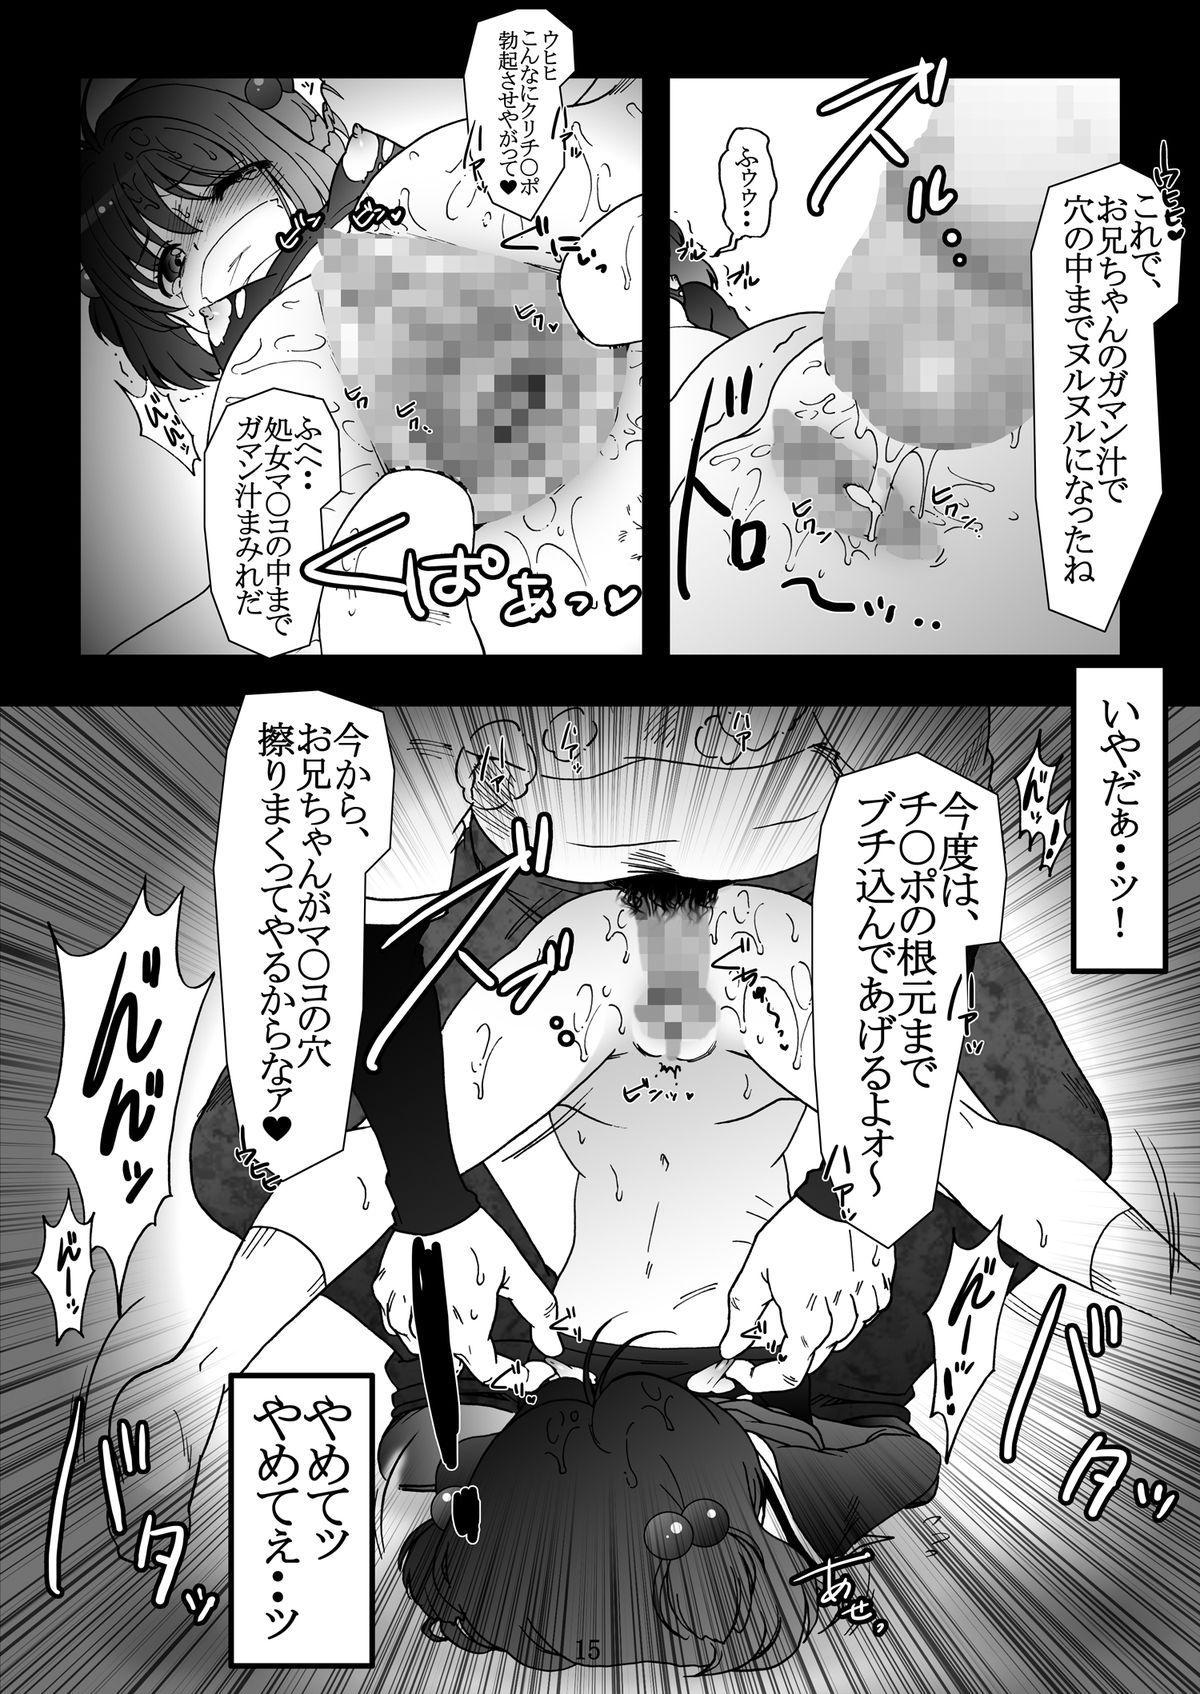 Sakura Slave to the Grind 14